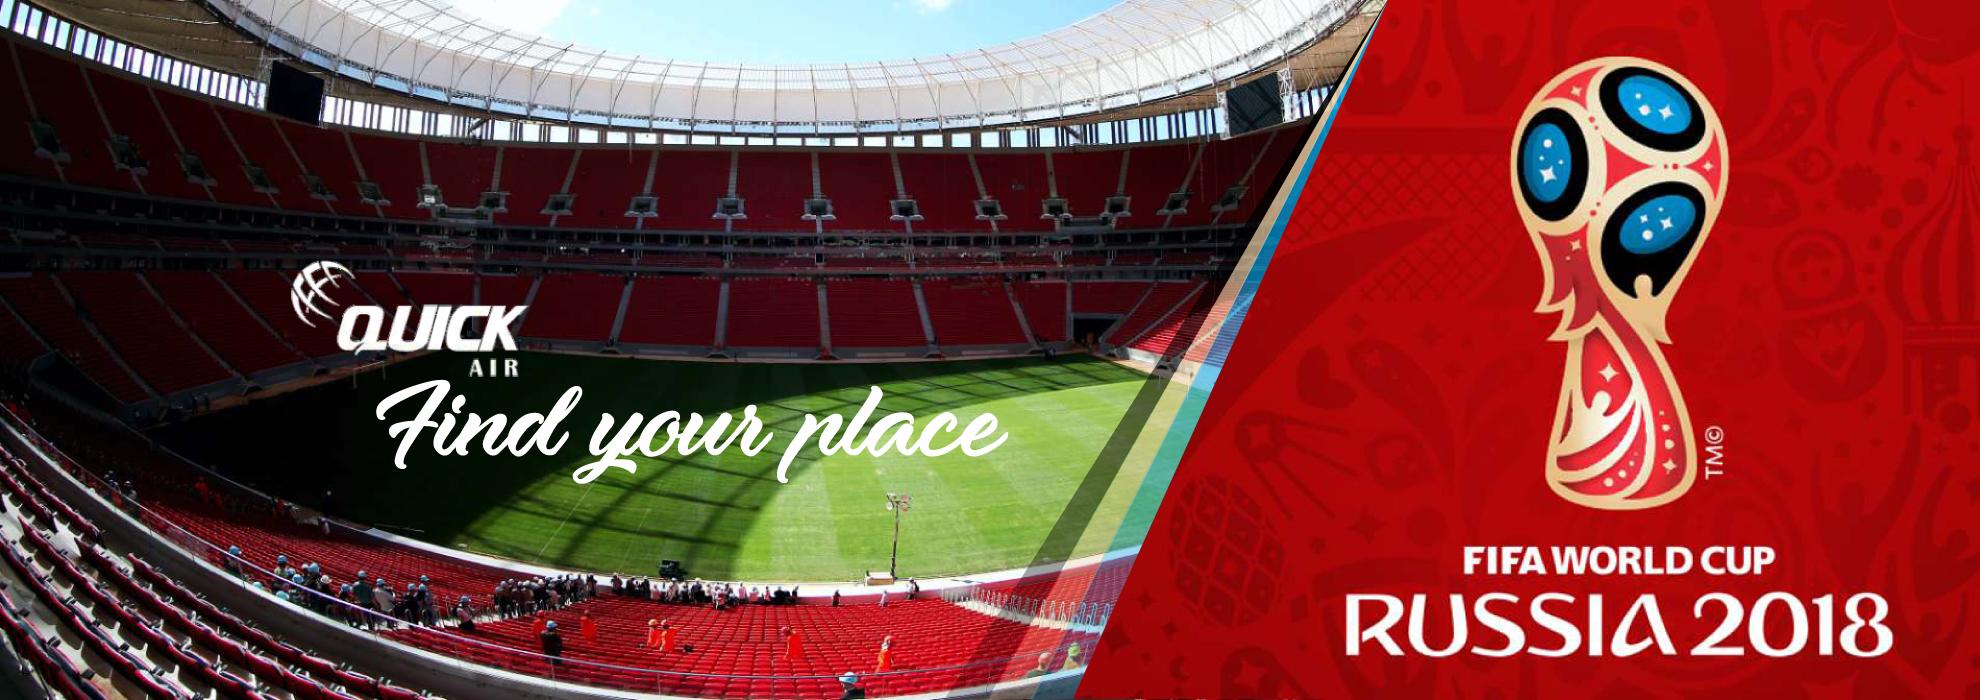 World Cup 2018 3CMEK15